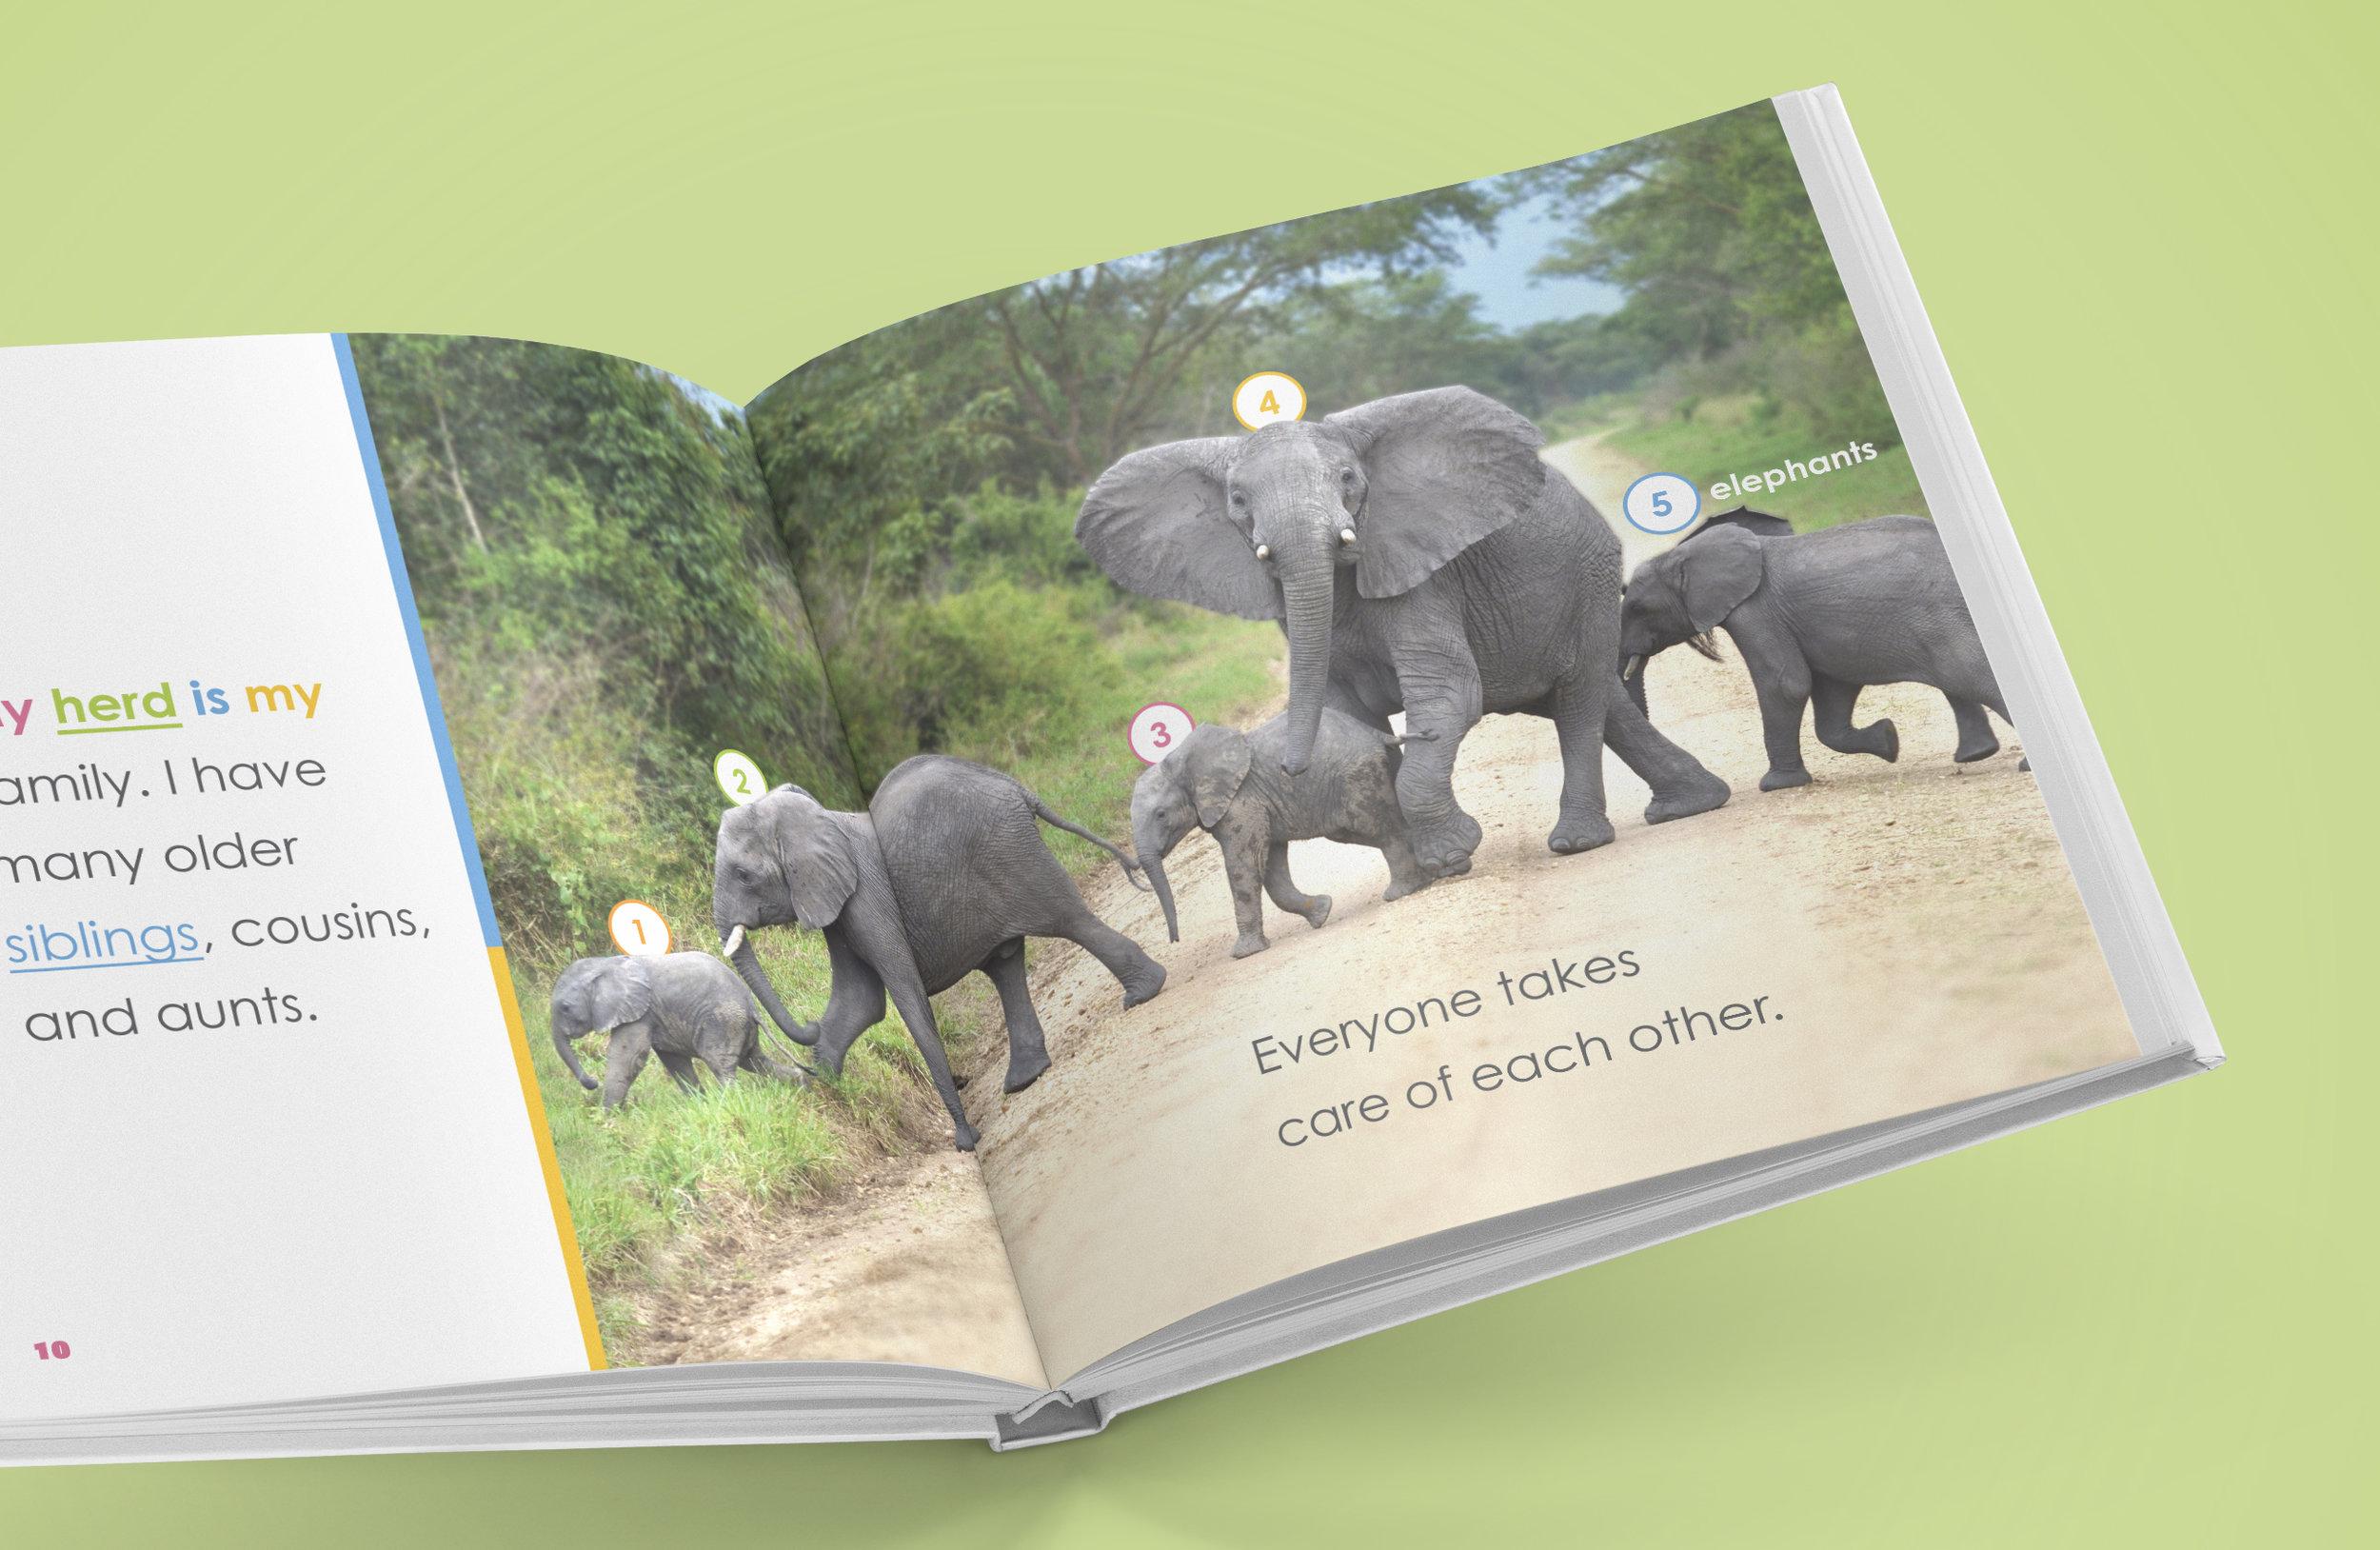 so_elephants_3.jpg